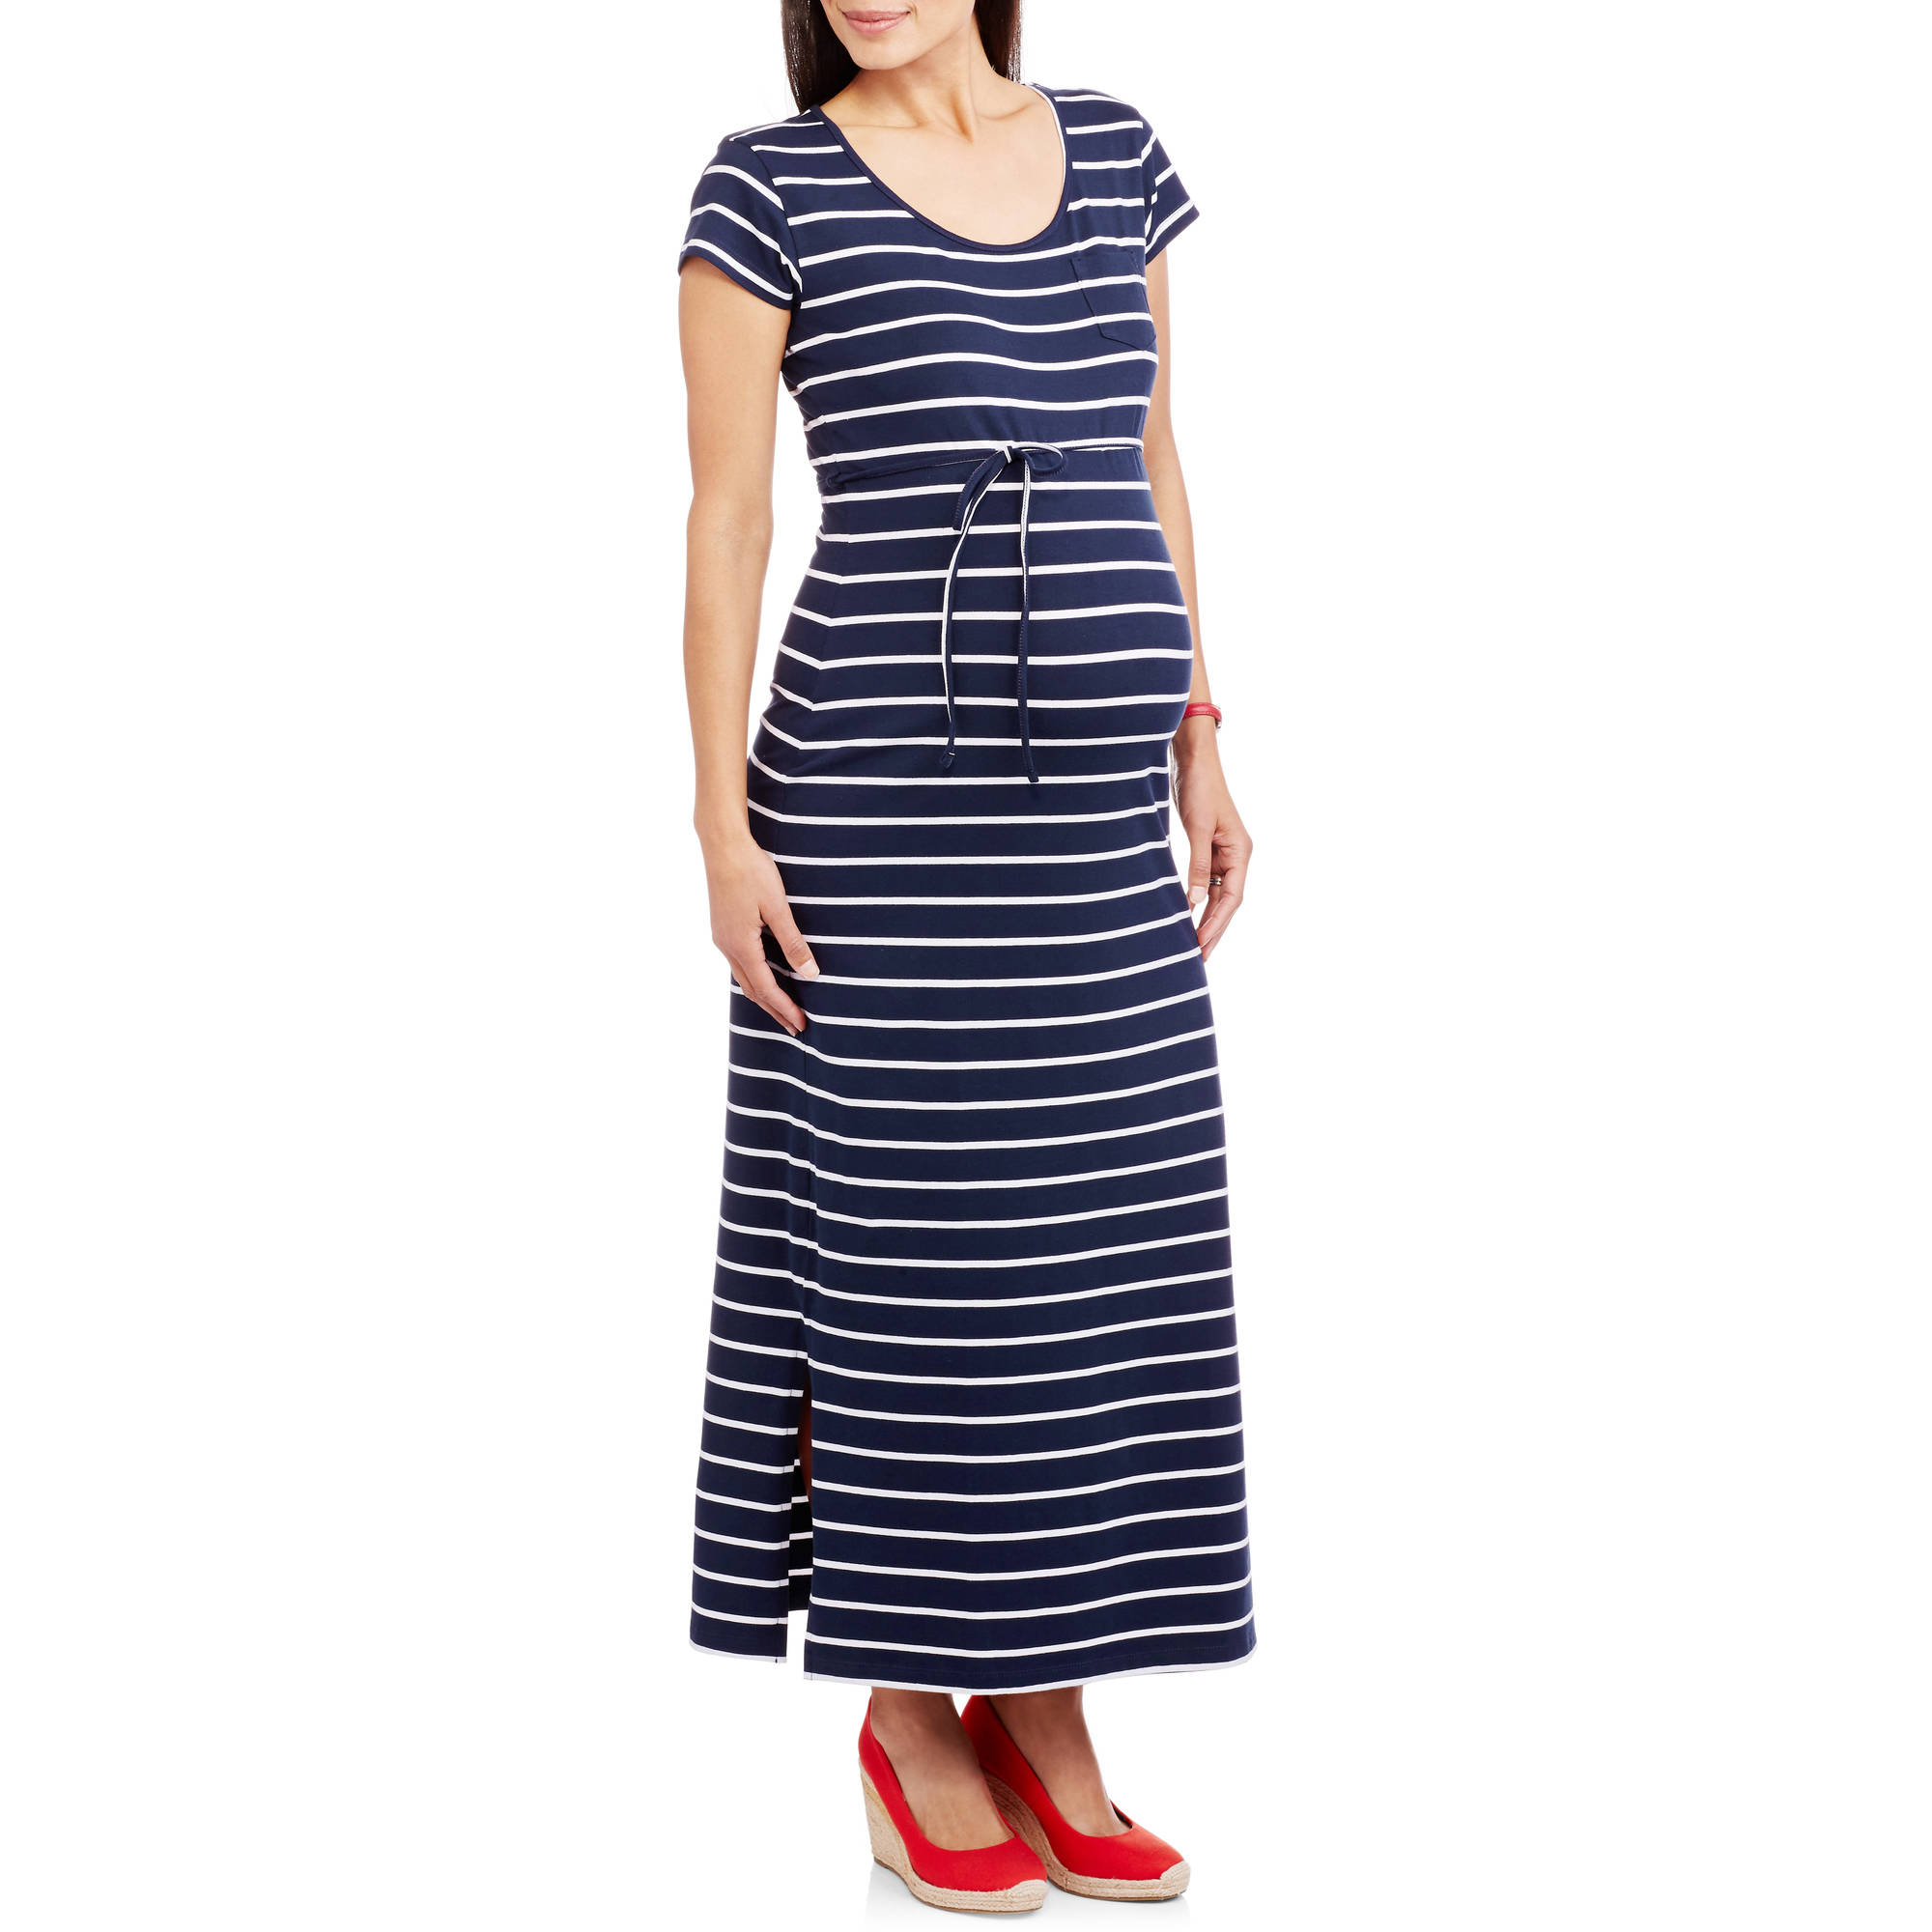 Oh! Mamma Maternity Cap Sleeve Striped Maxi Dress with Tie Belt